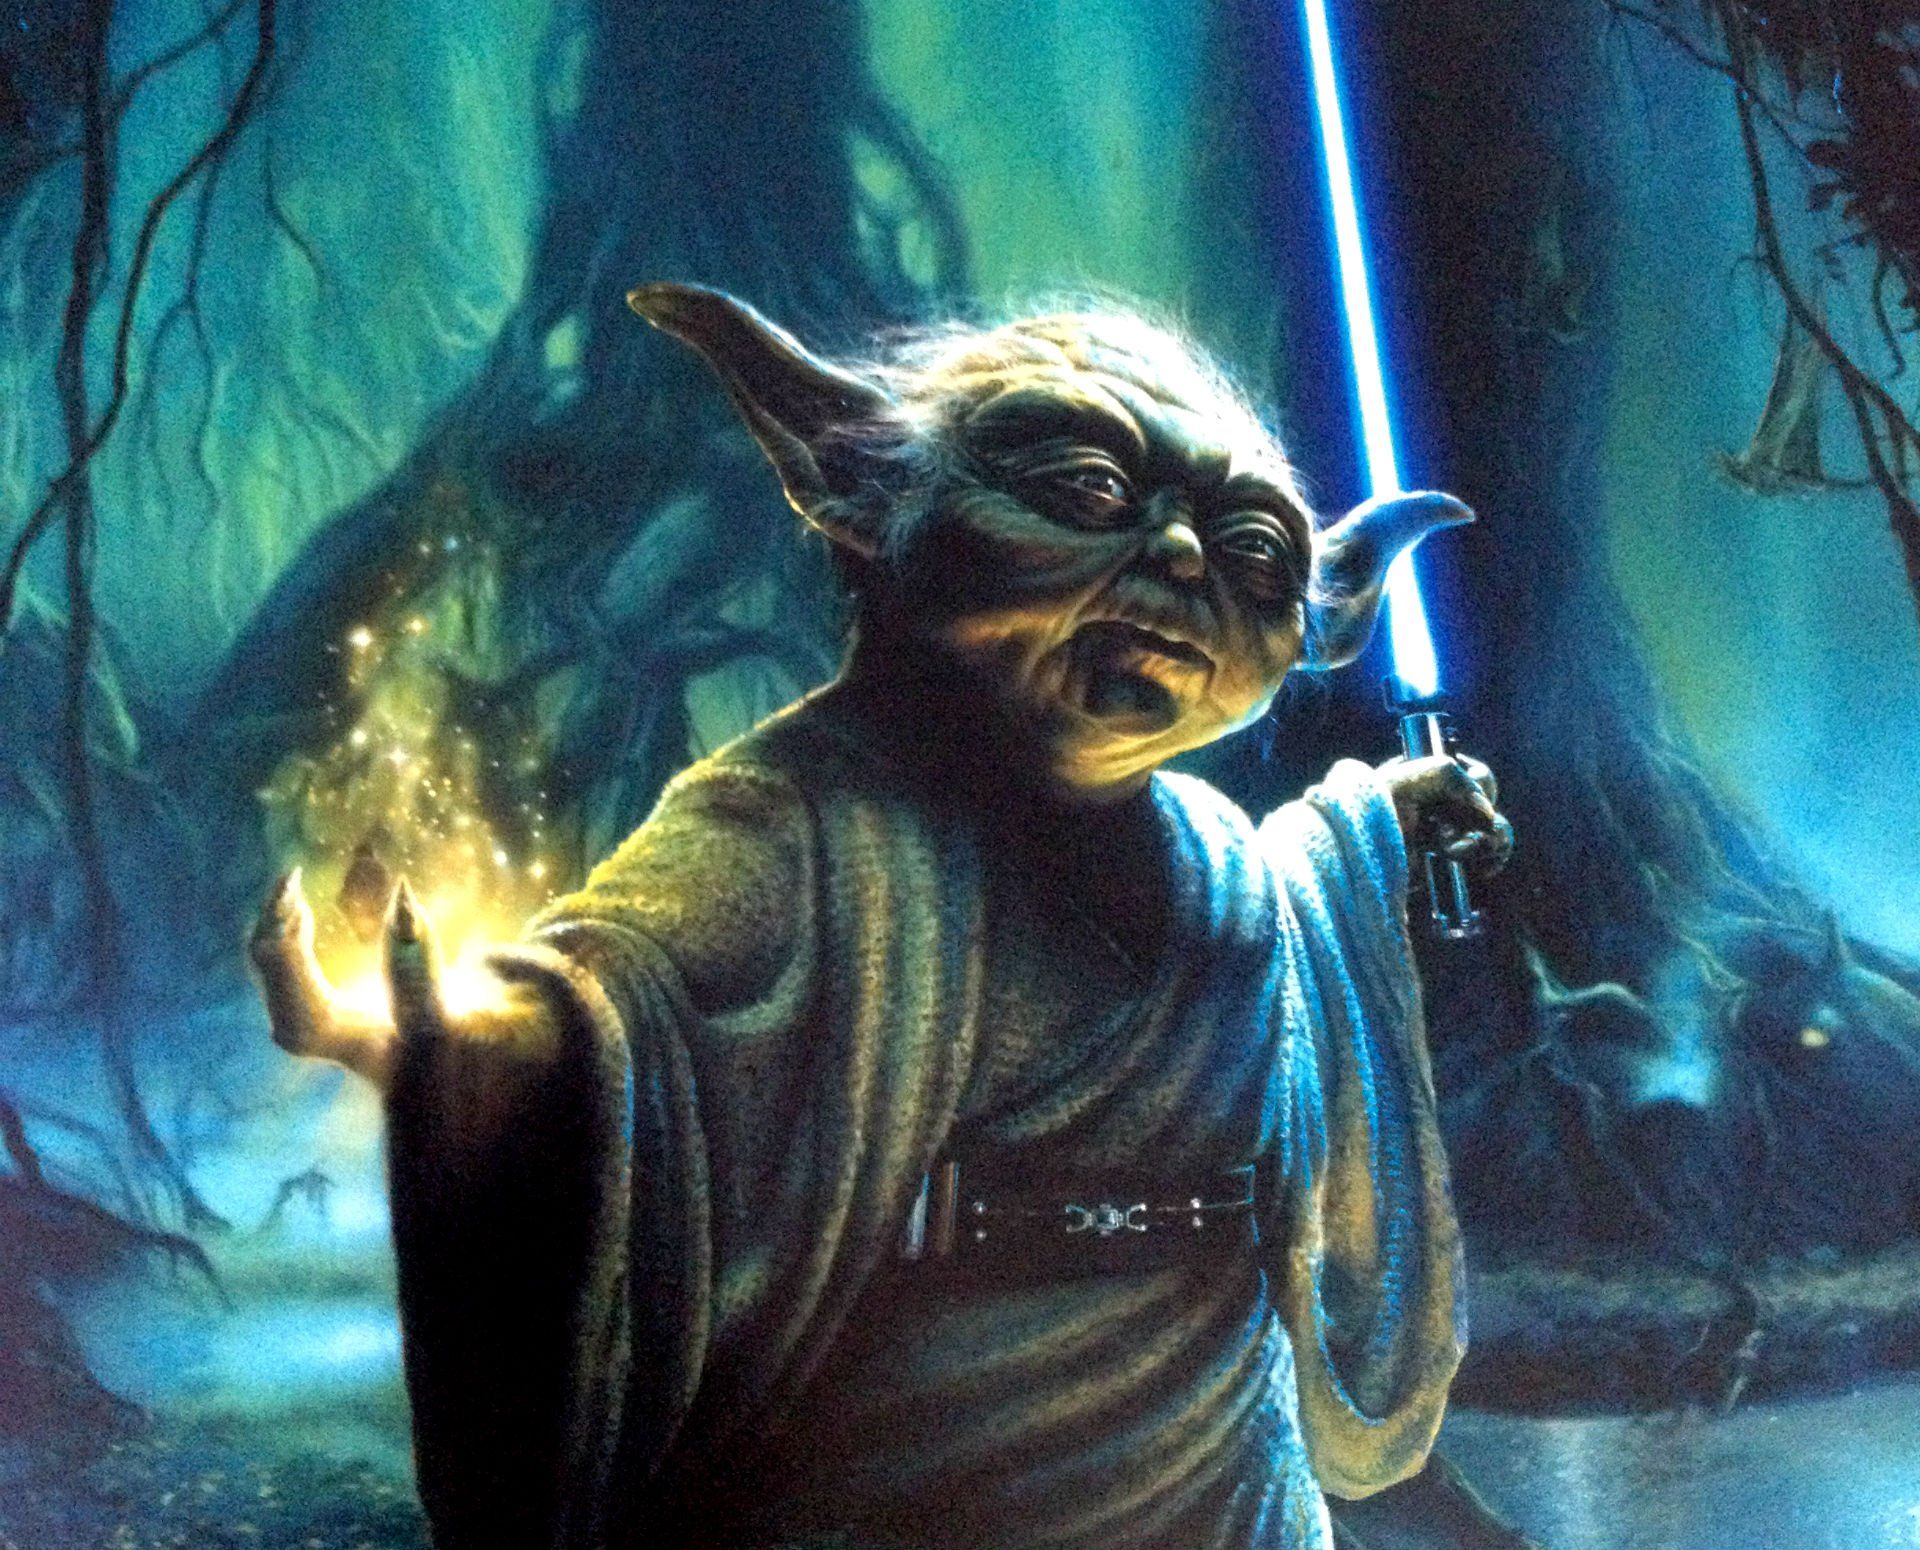 Star Wars Yoda Wallpaper Star Wars Attack Clones Sci Fi Action